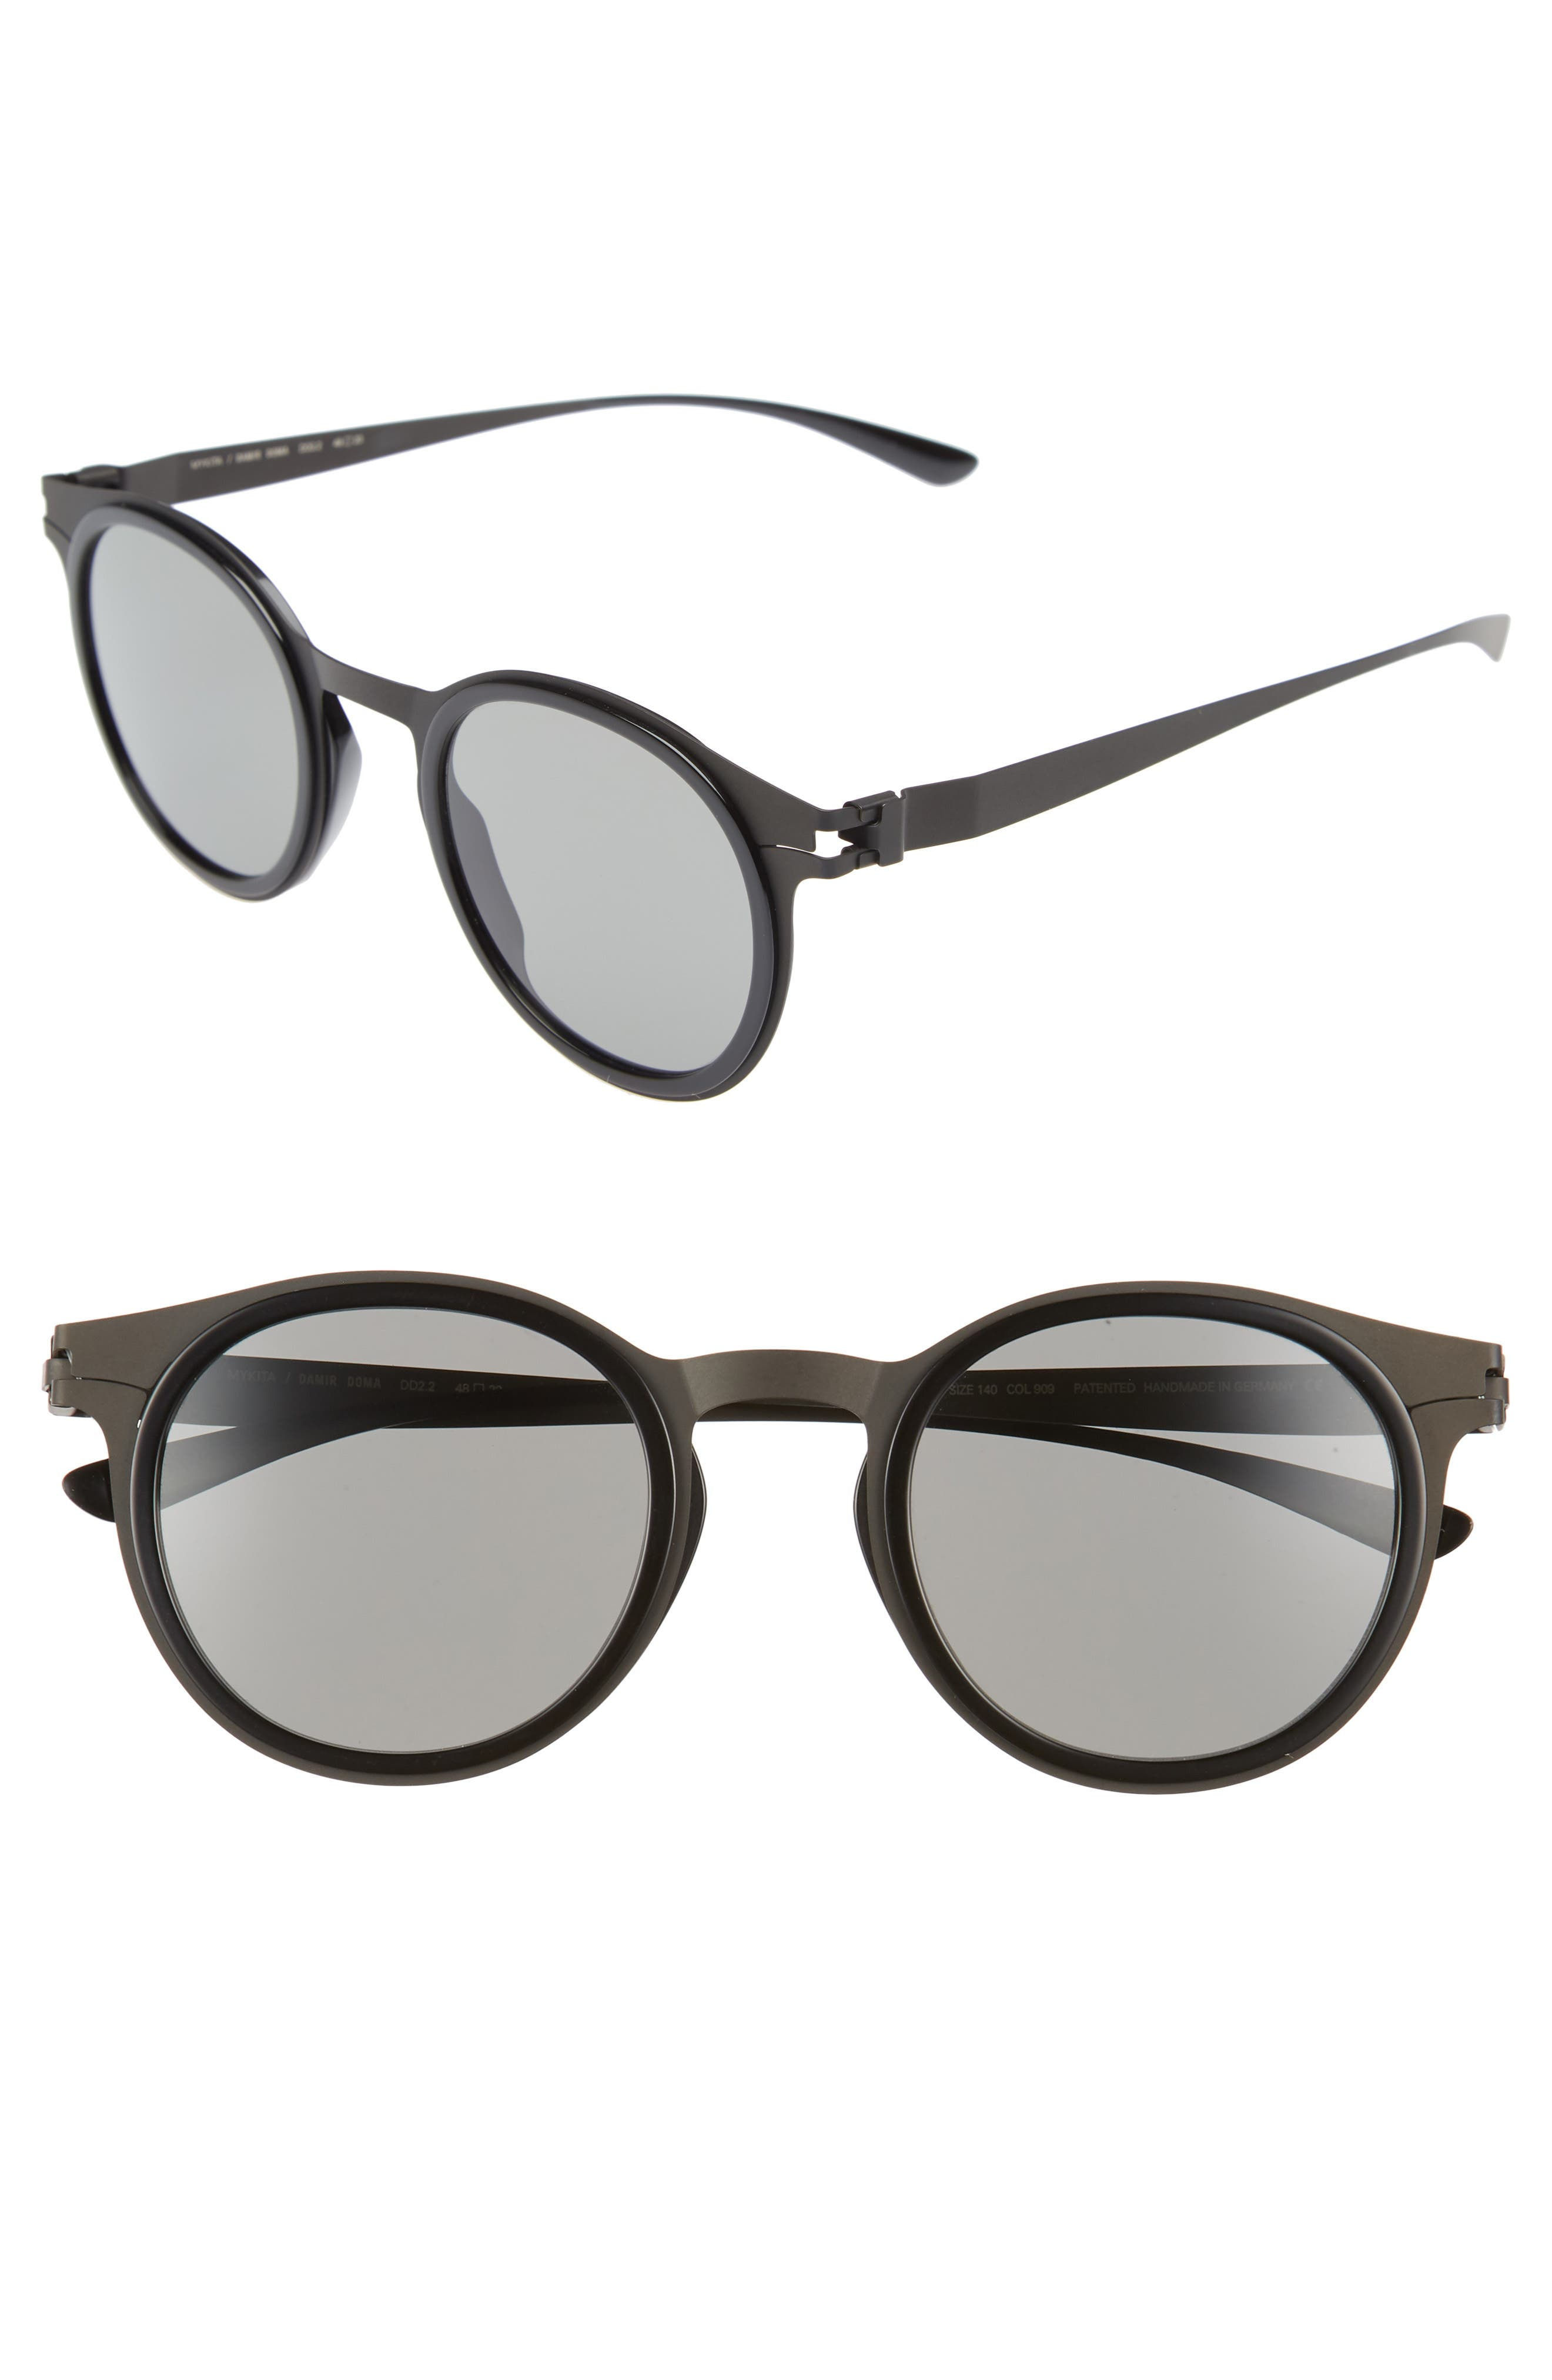 DD2.2 48mm Round Sunglasses,                         Main,                         color, 001